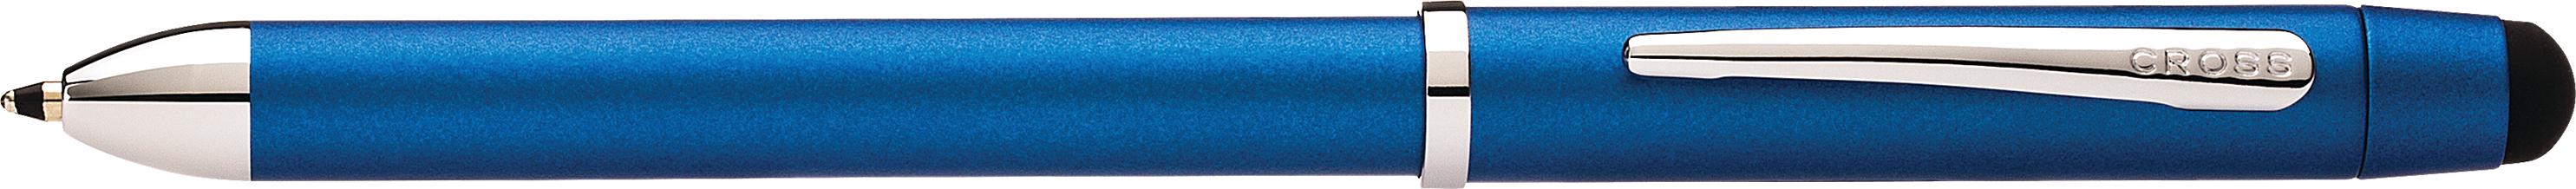 Tech3+ Metallic Blue Multifunction Pen